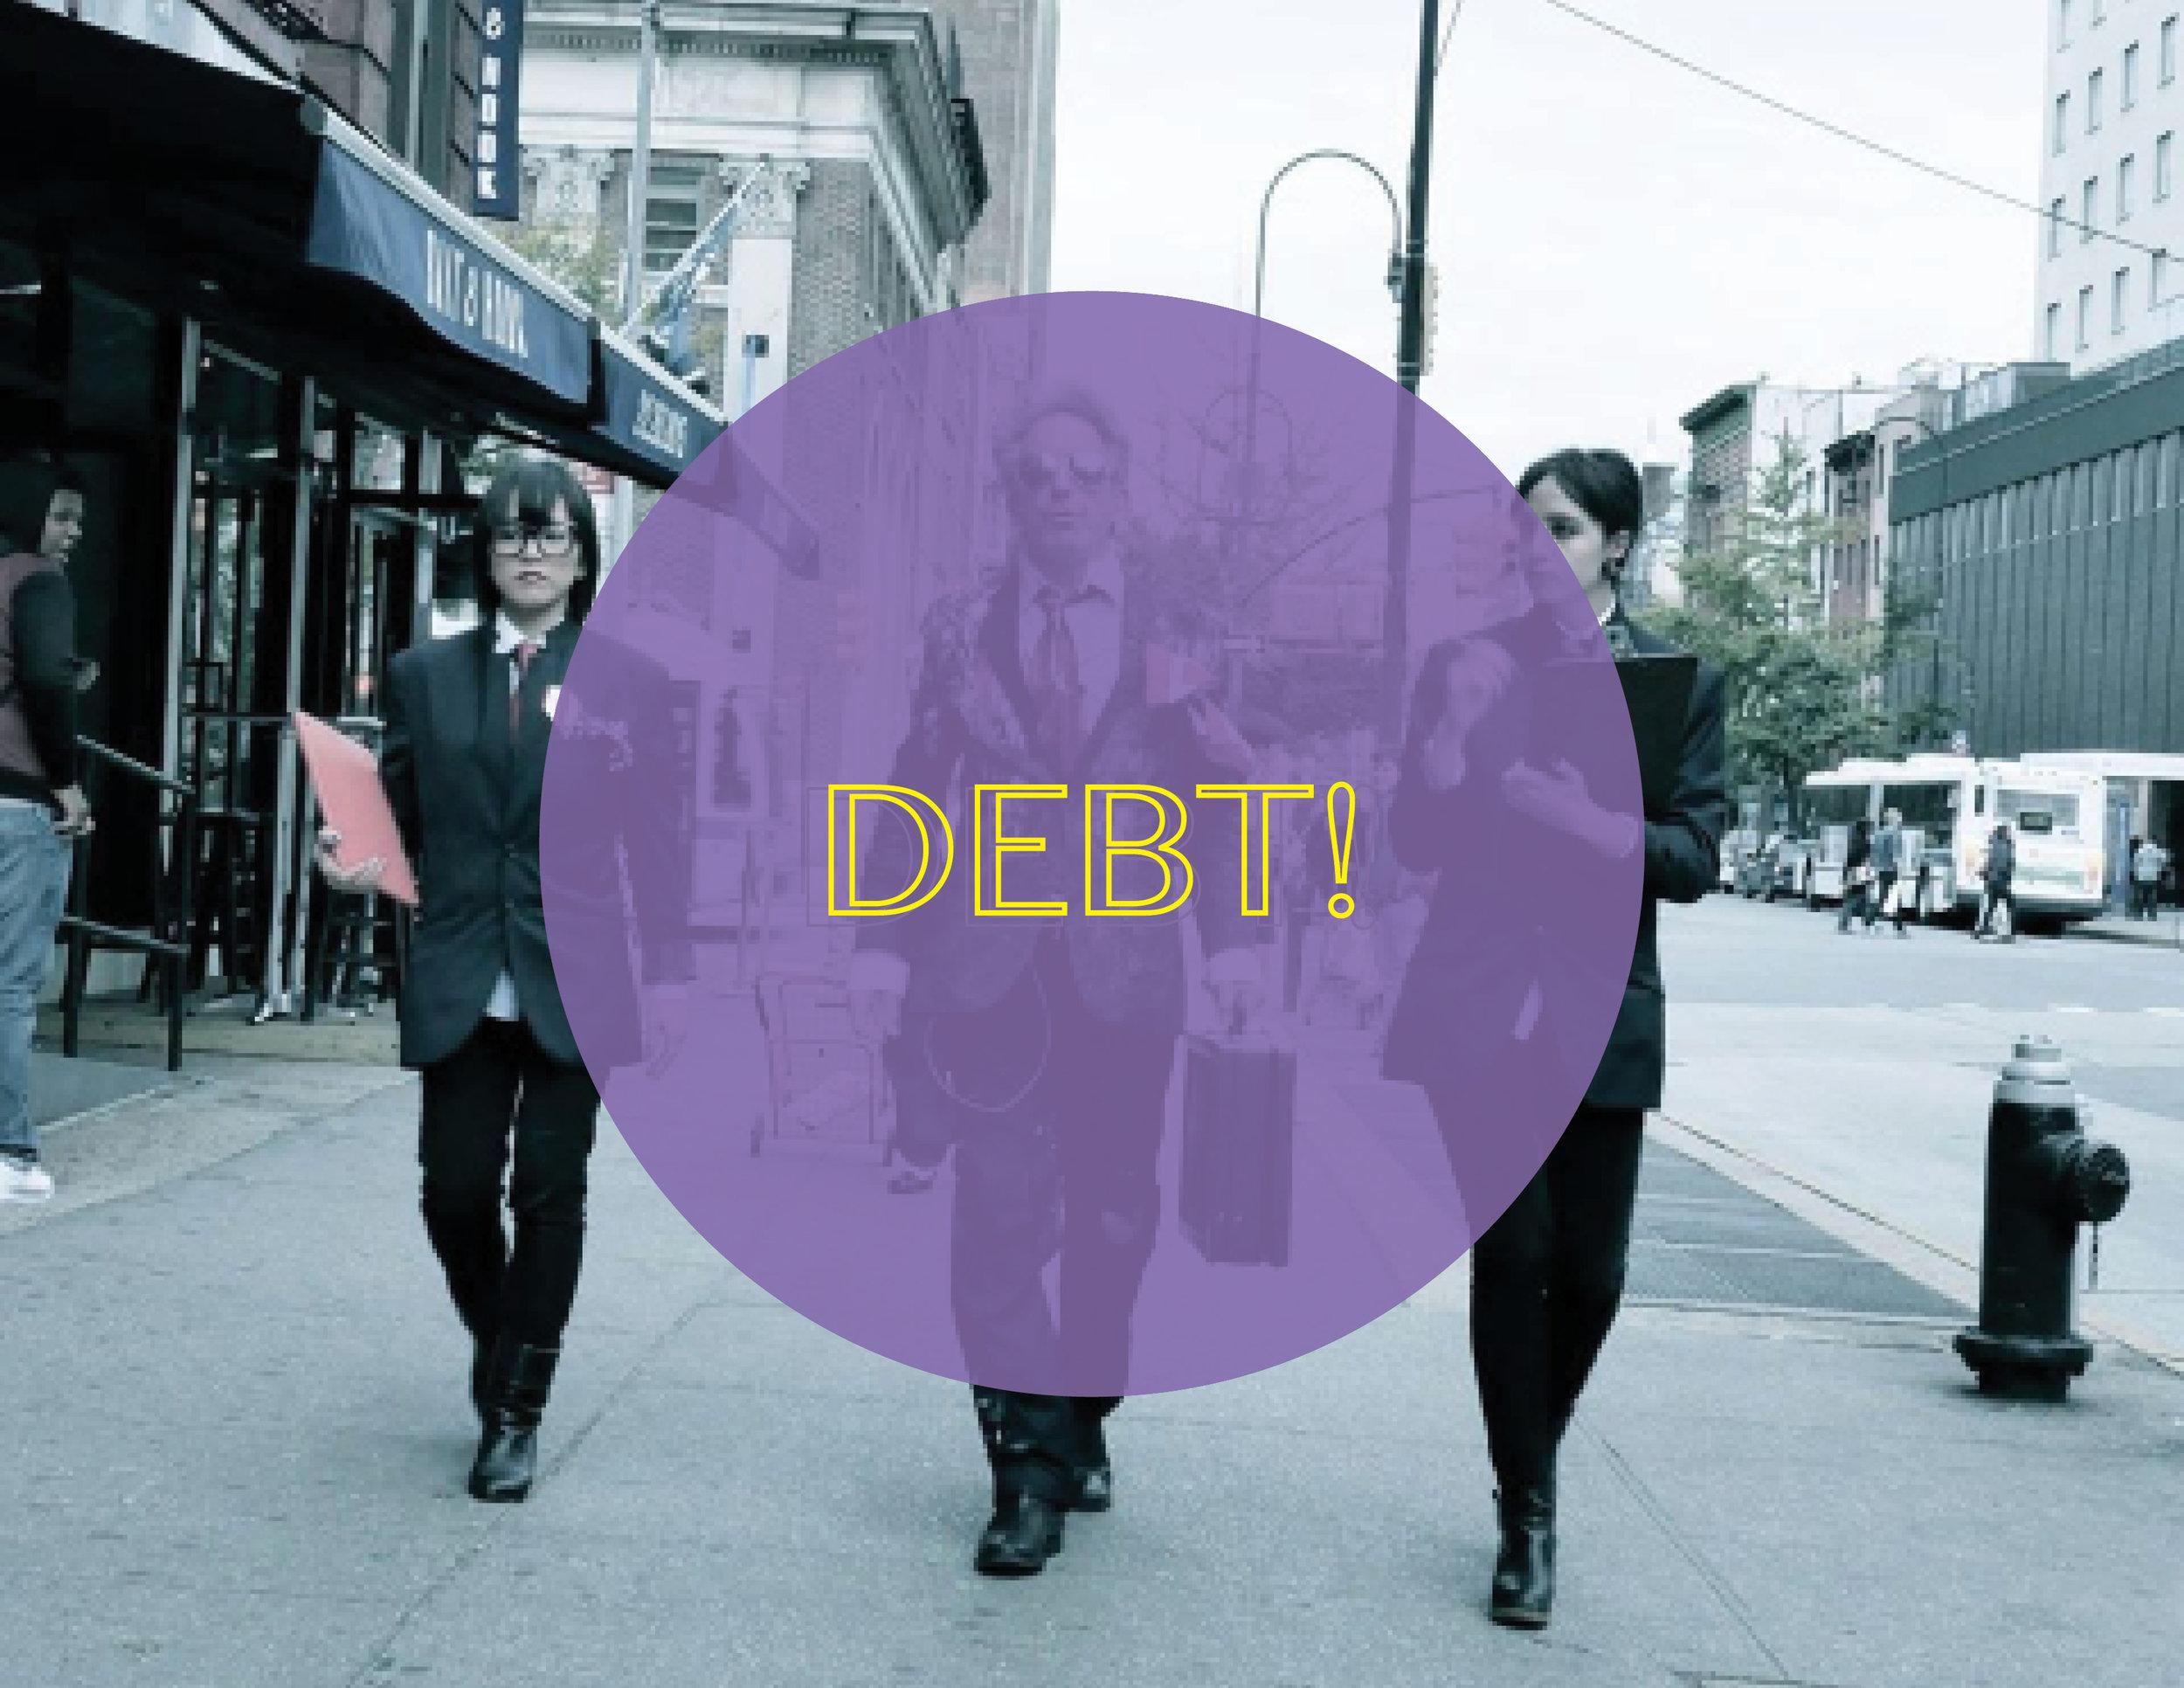 Debt!.jpg